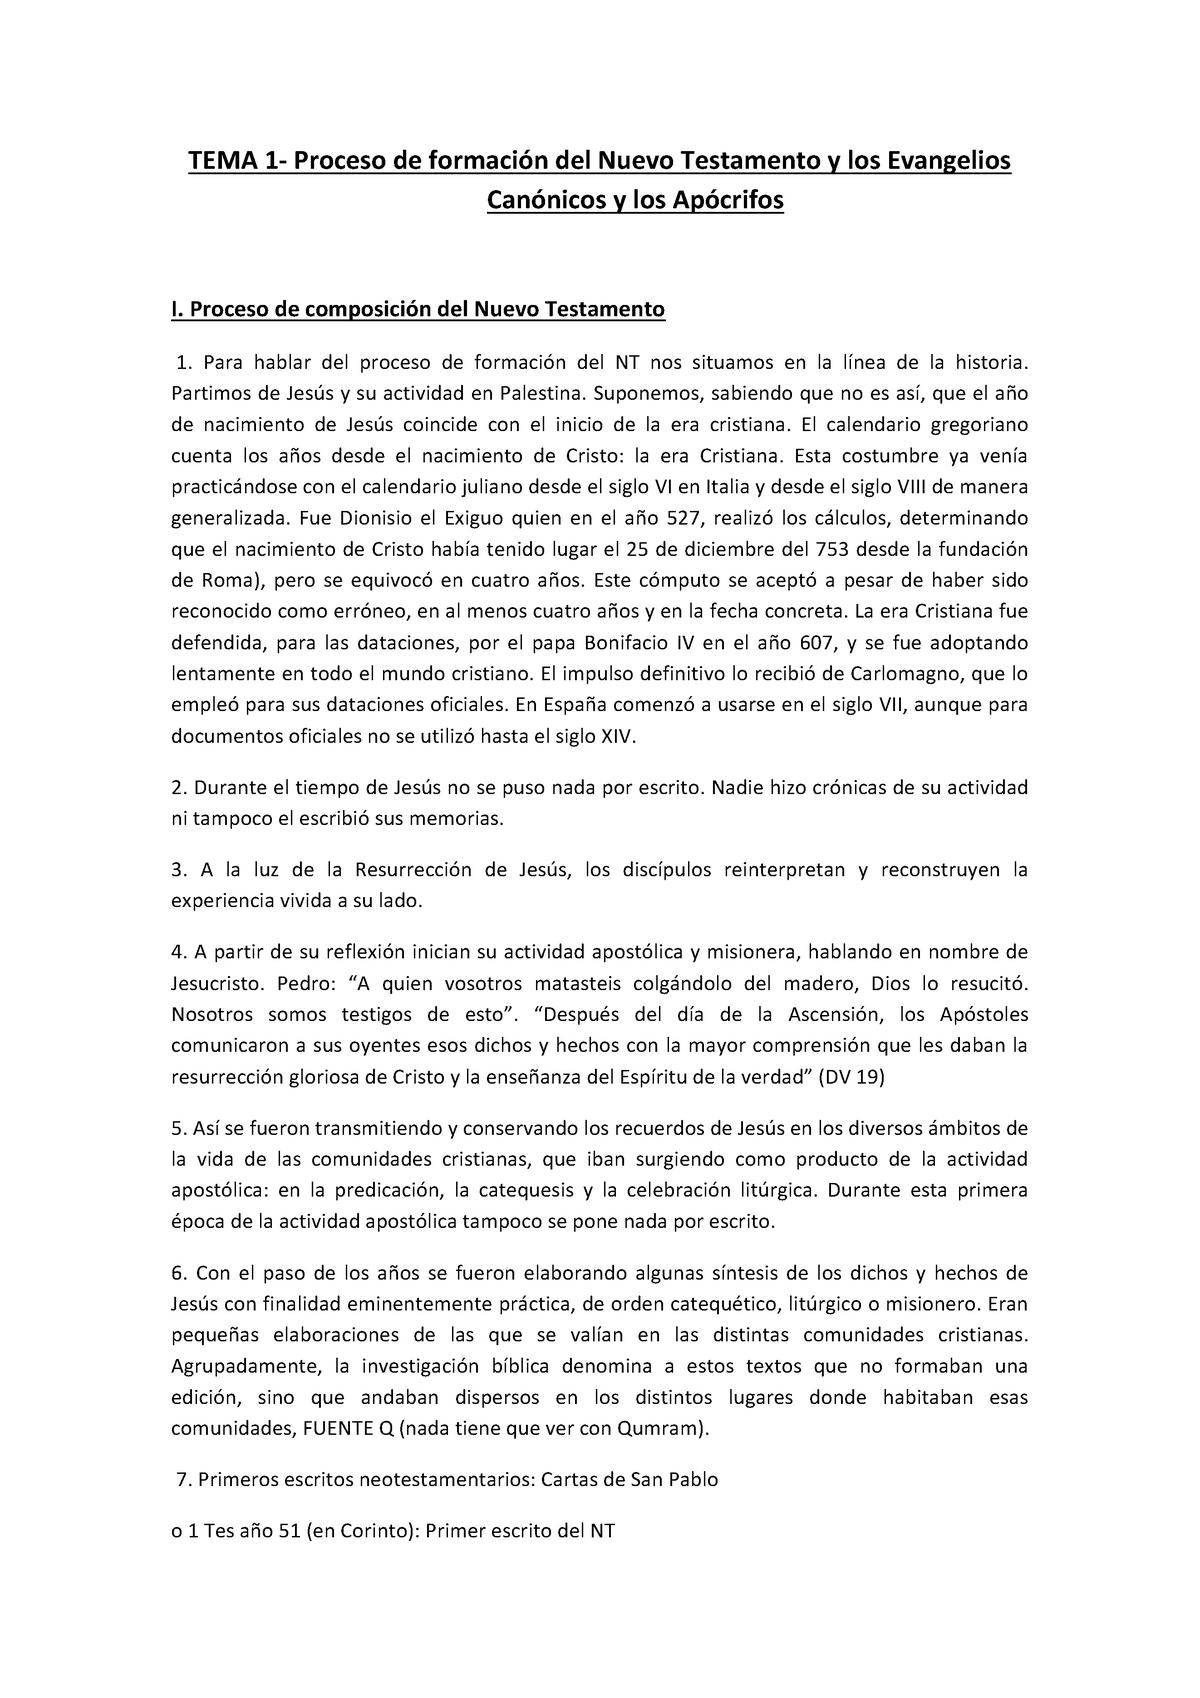 Apuntes Completos Prof Juan Piña Batista 41118047 Uca